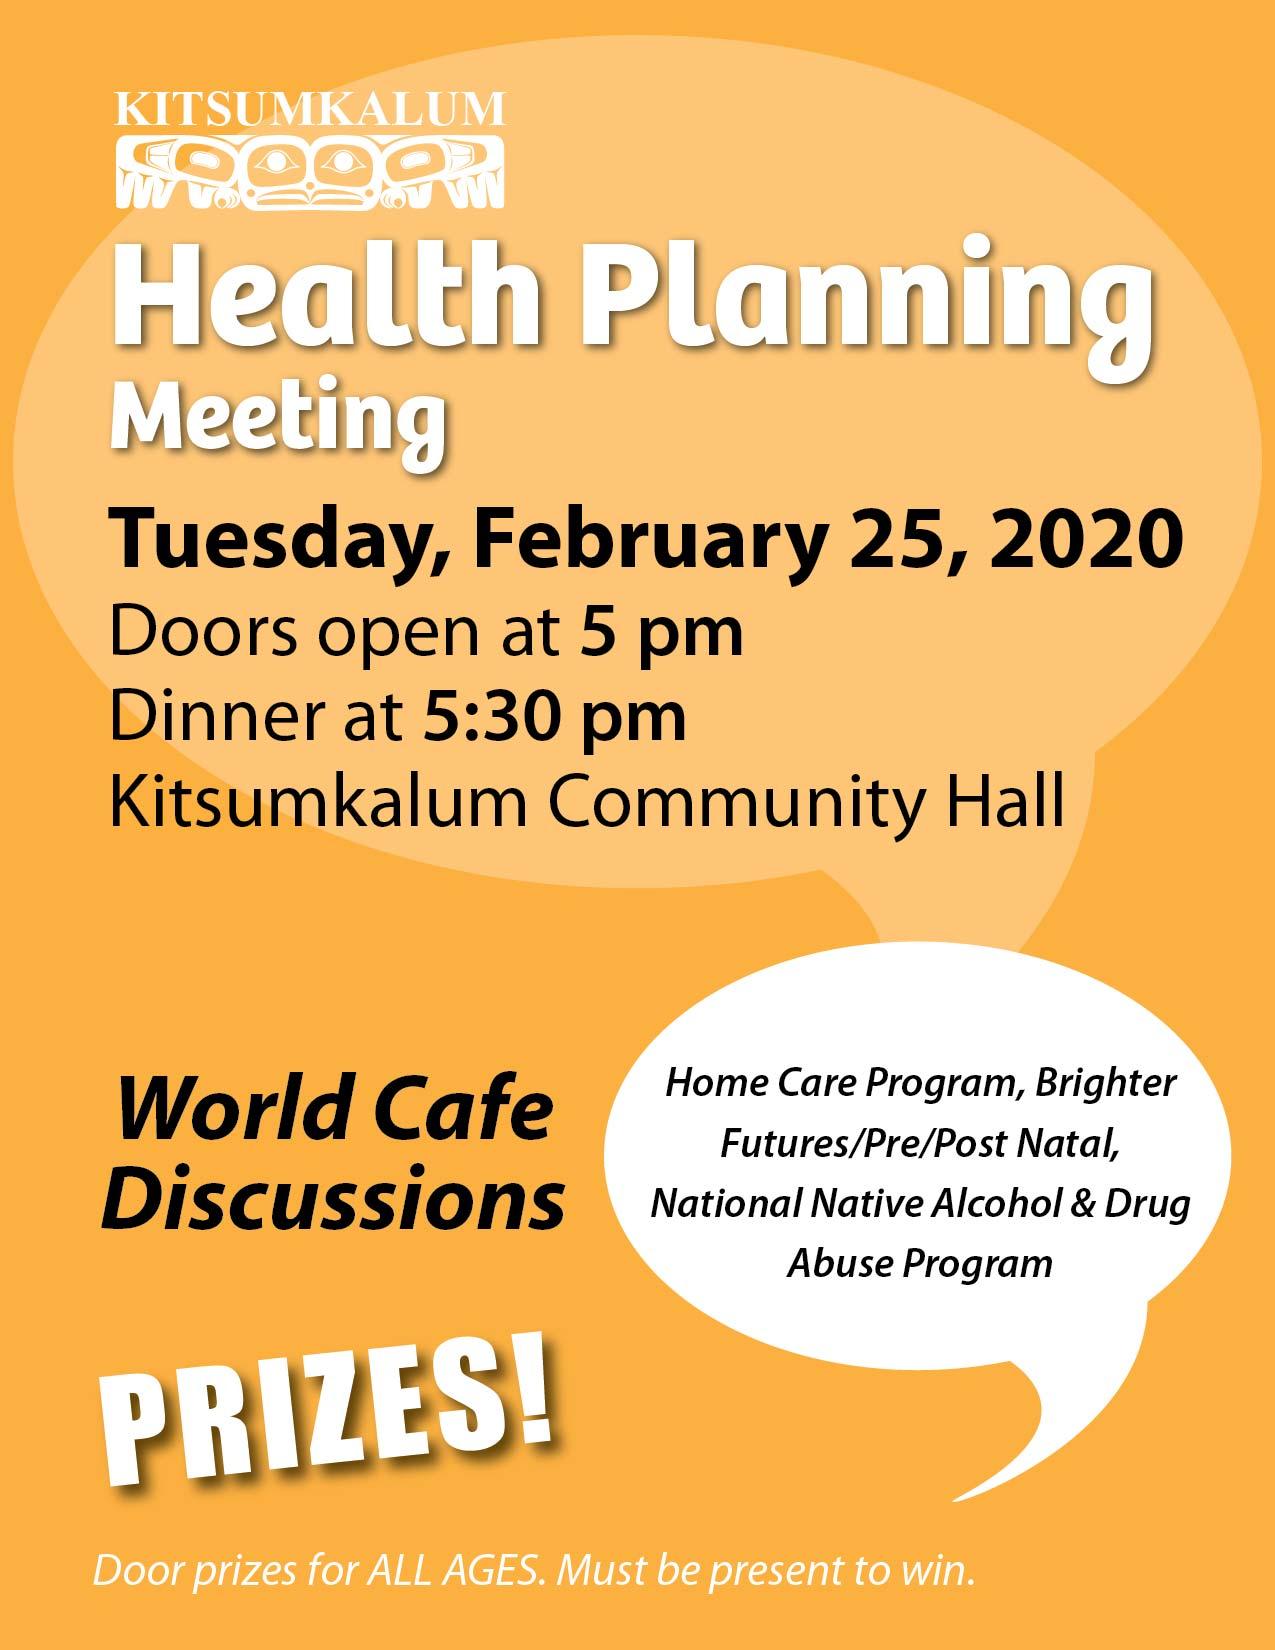 FEB 25 Kitsumkalum Health Planning Meeting